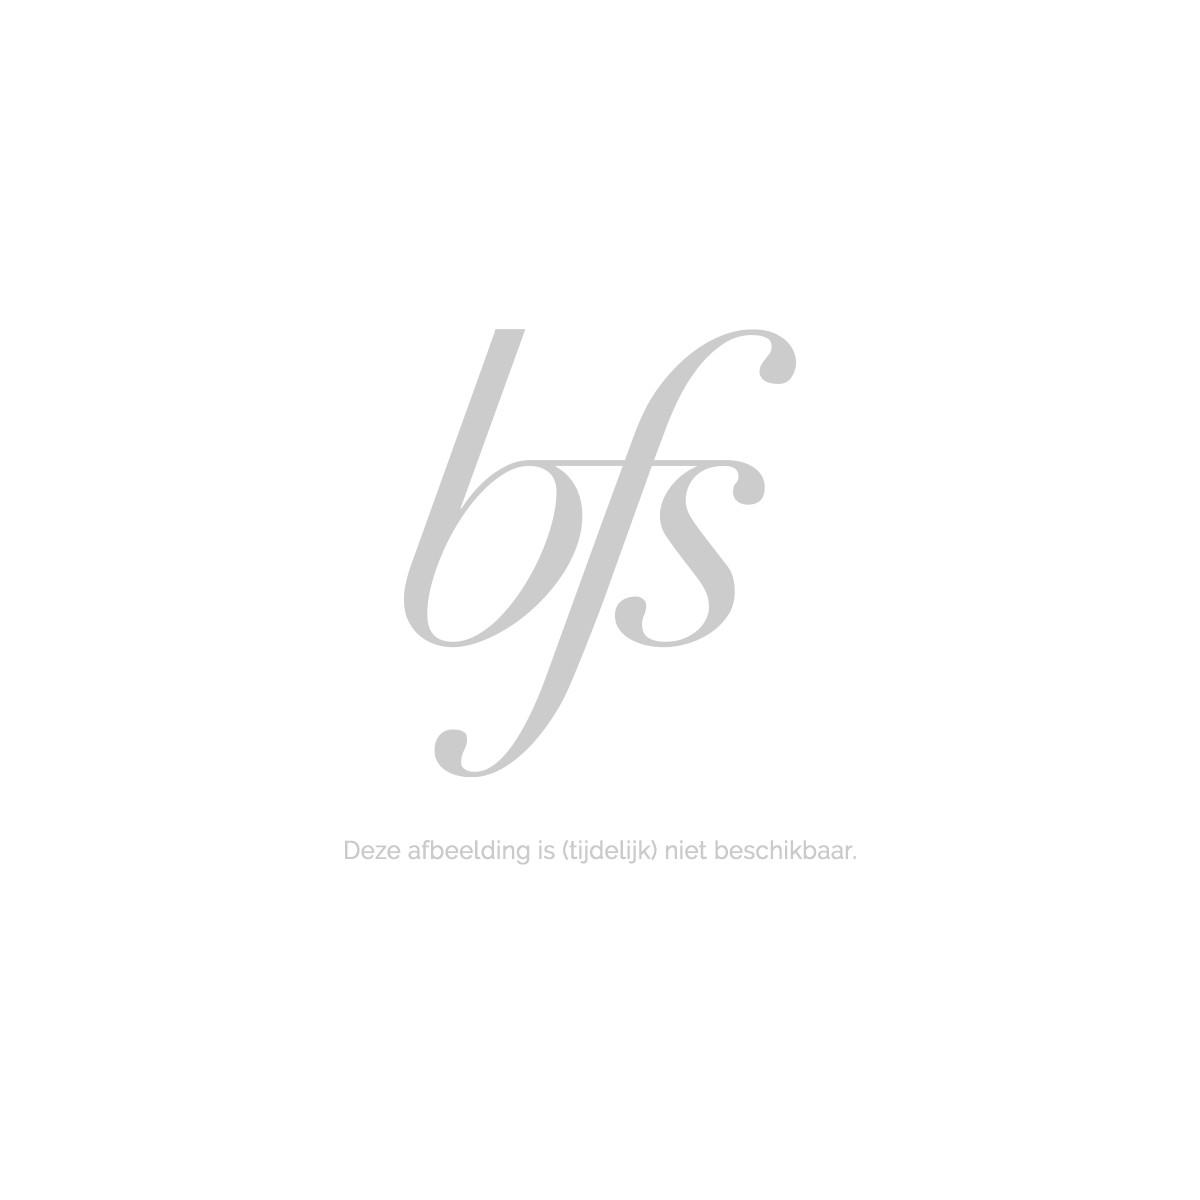 Elie Saab Le Parfum Body Lotion 200 Ml Gnstig Hautpflege Kaufen